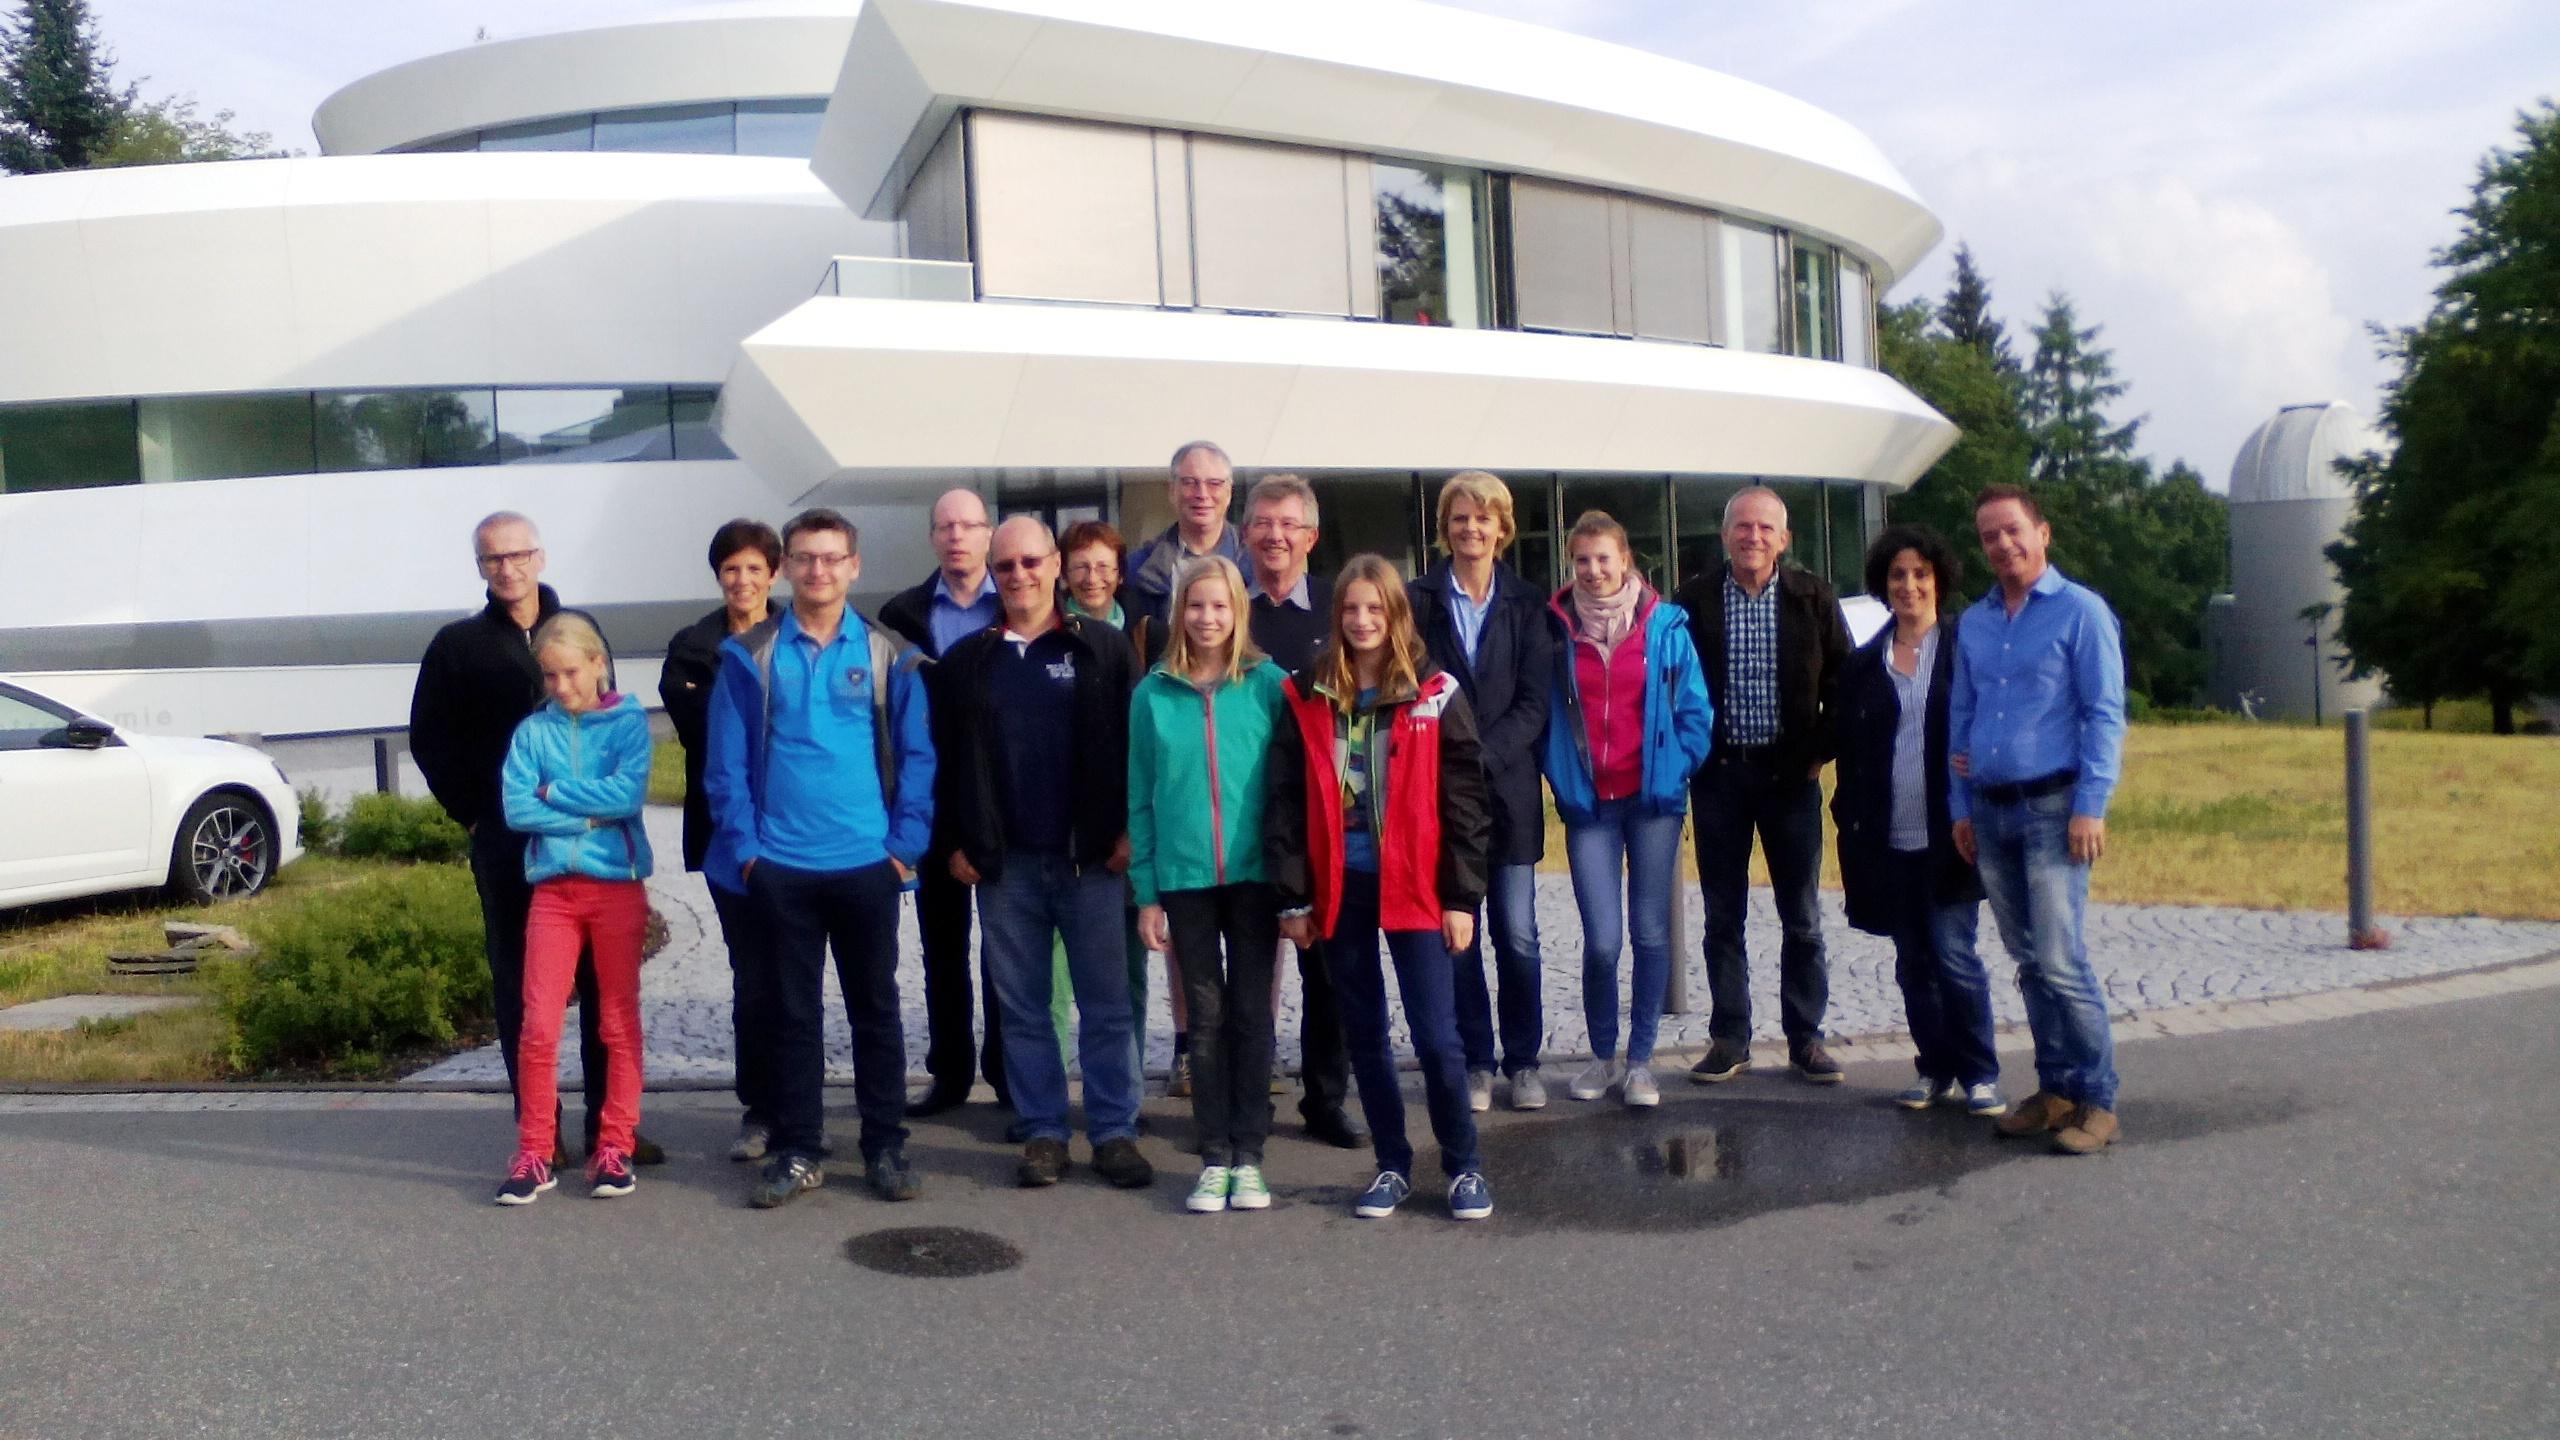 2015-06-18-Haus-der-Astronomie-orig